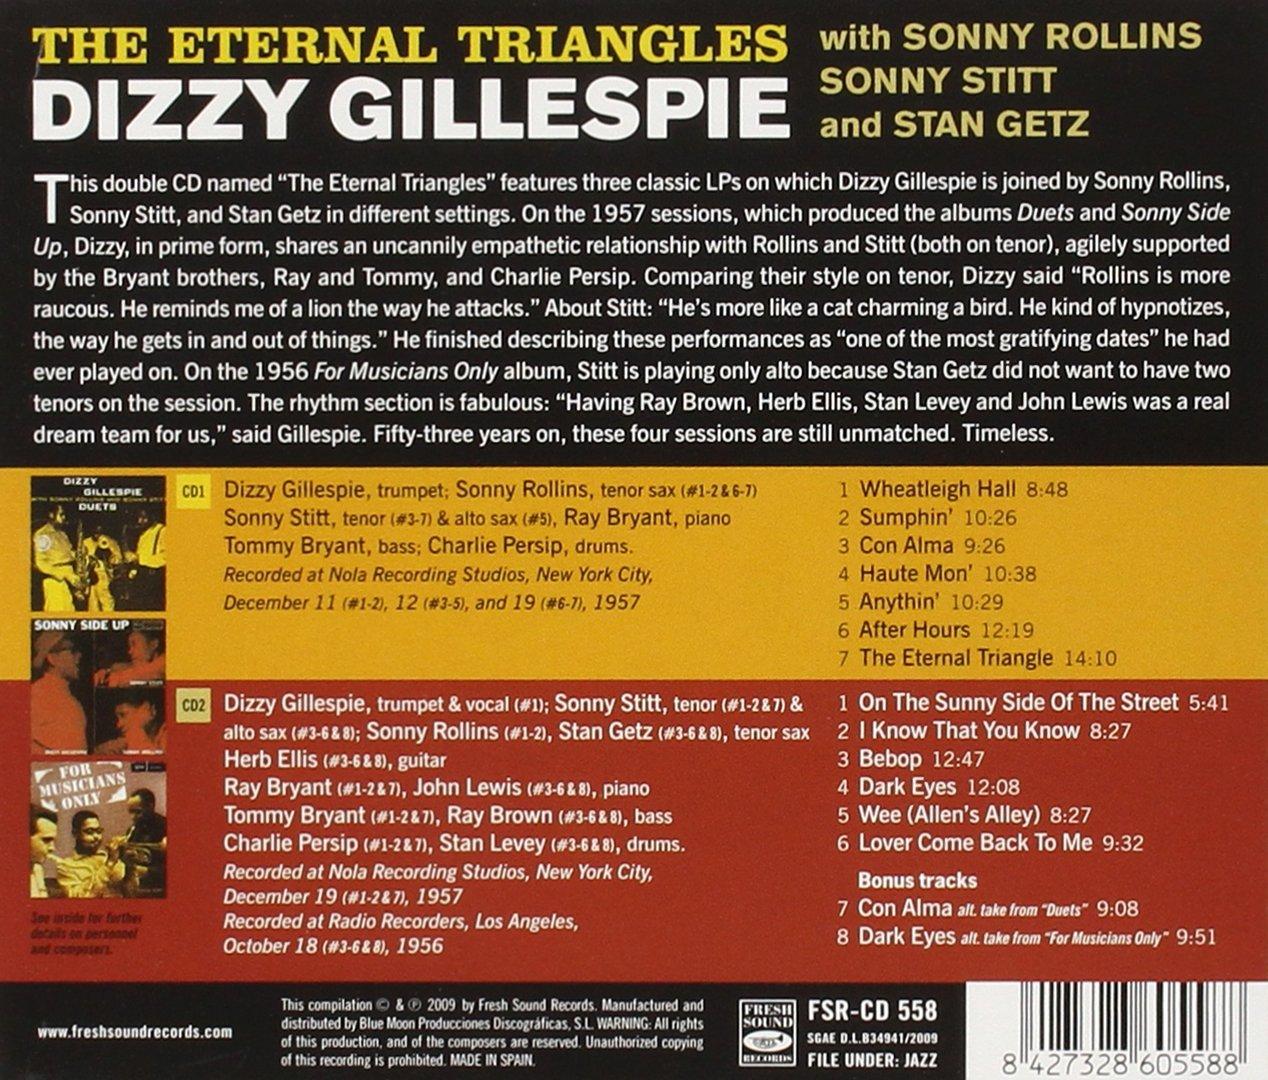 Si j'aime le jazz... - Page 9 81ZfodjOqYL._SL1268_